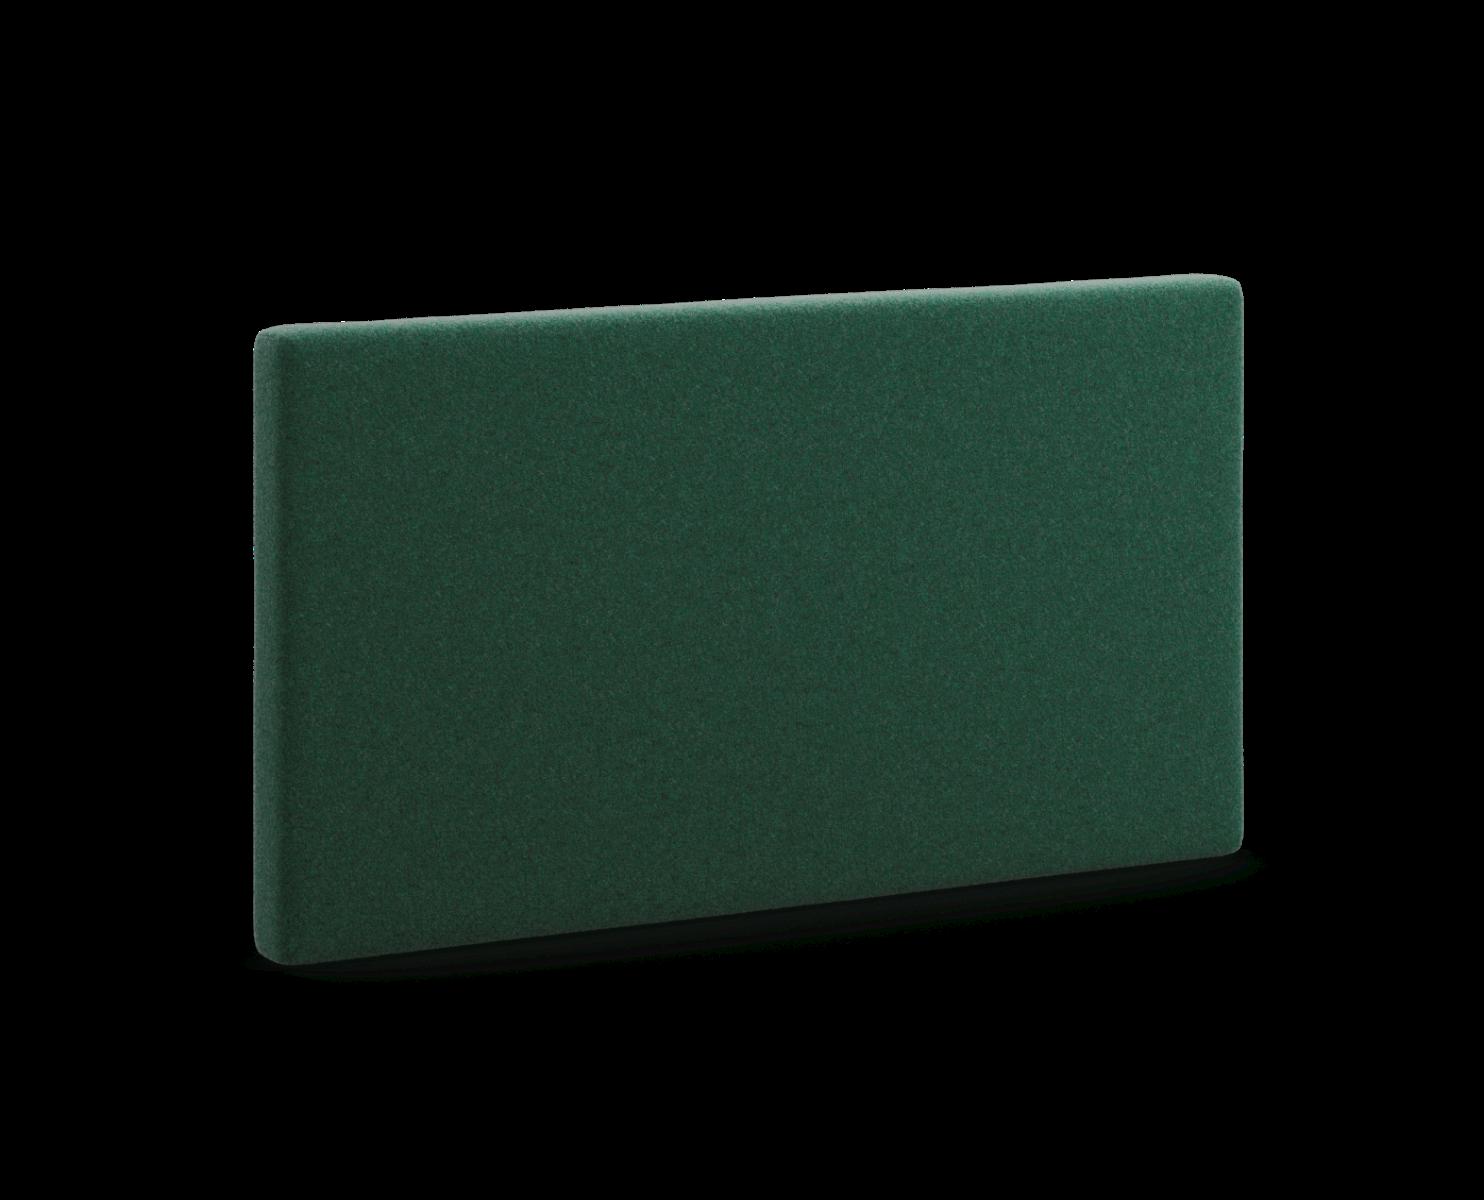 Køb Ovia Væghængt - 160x108x8 Grønn